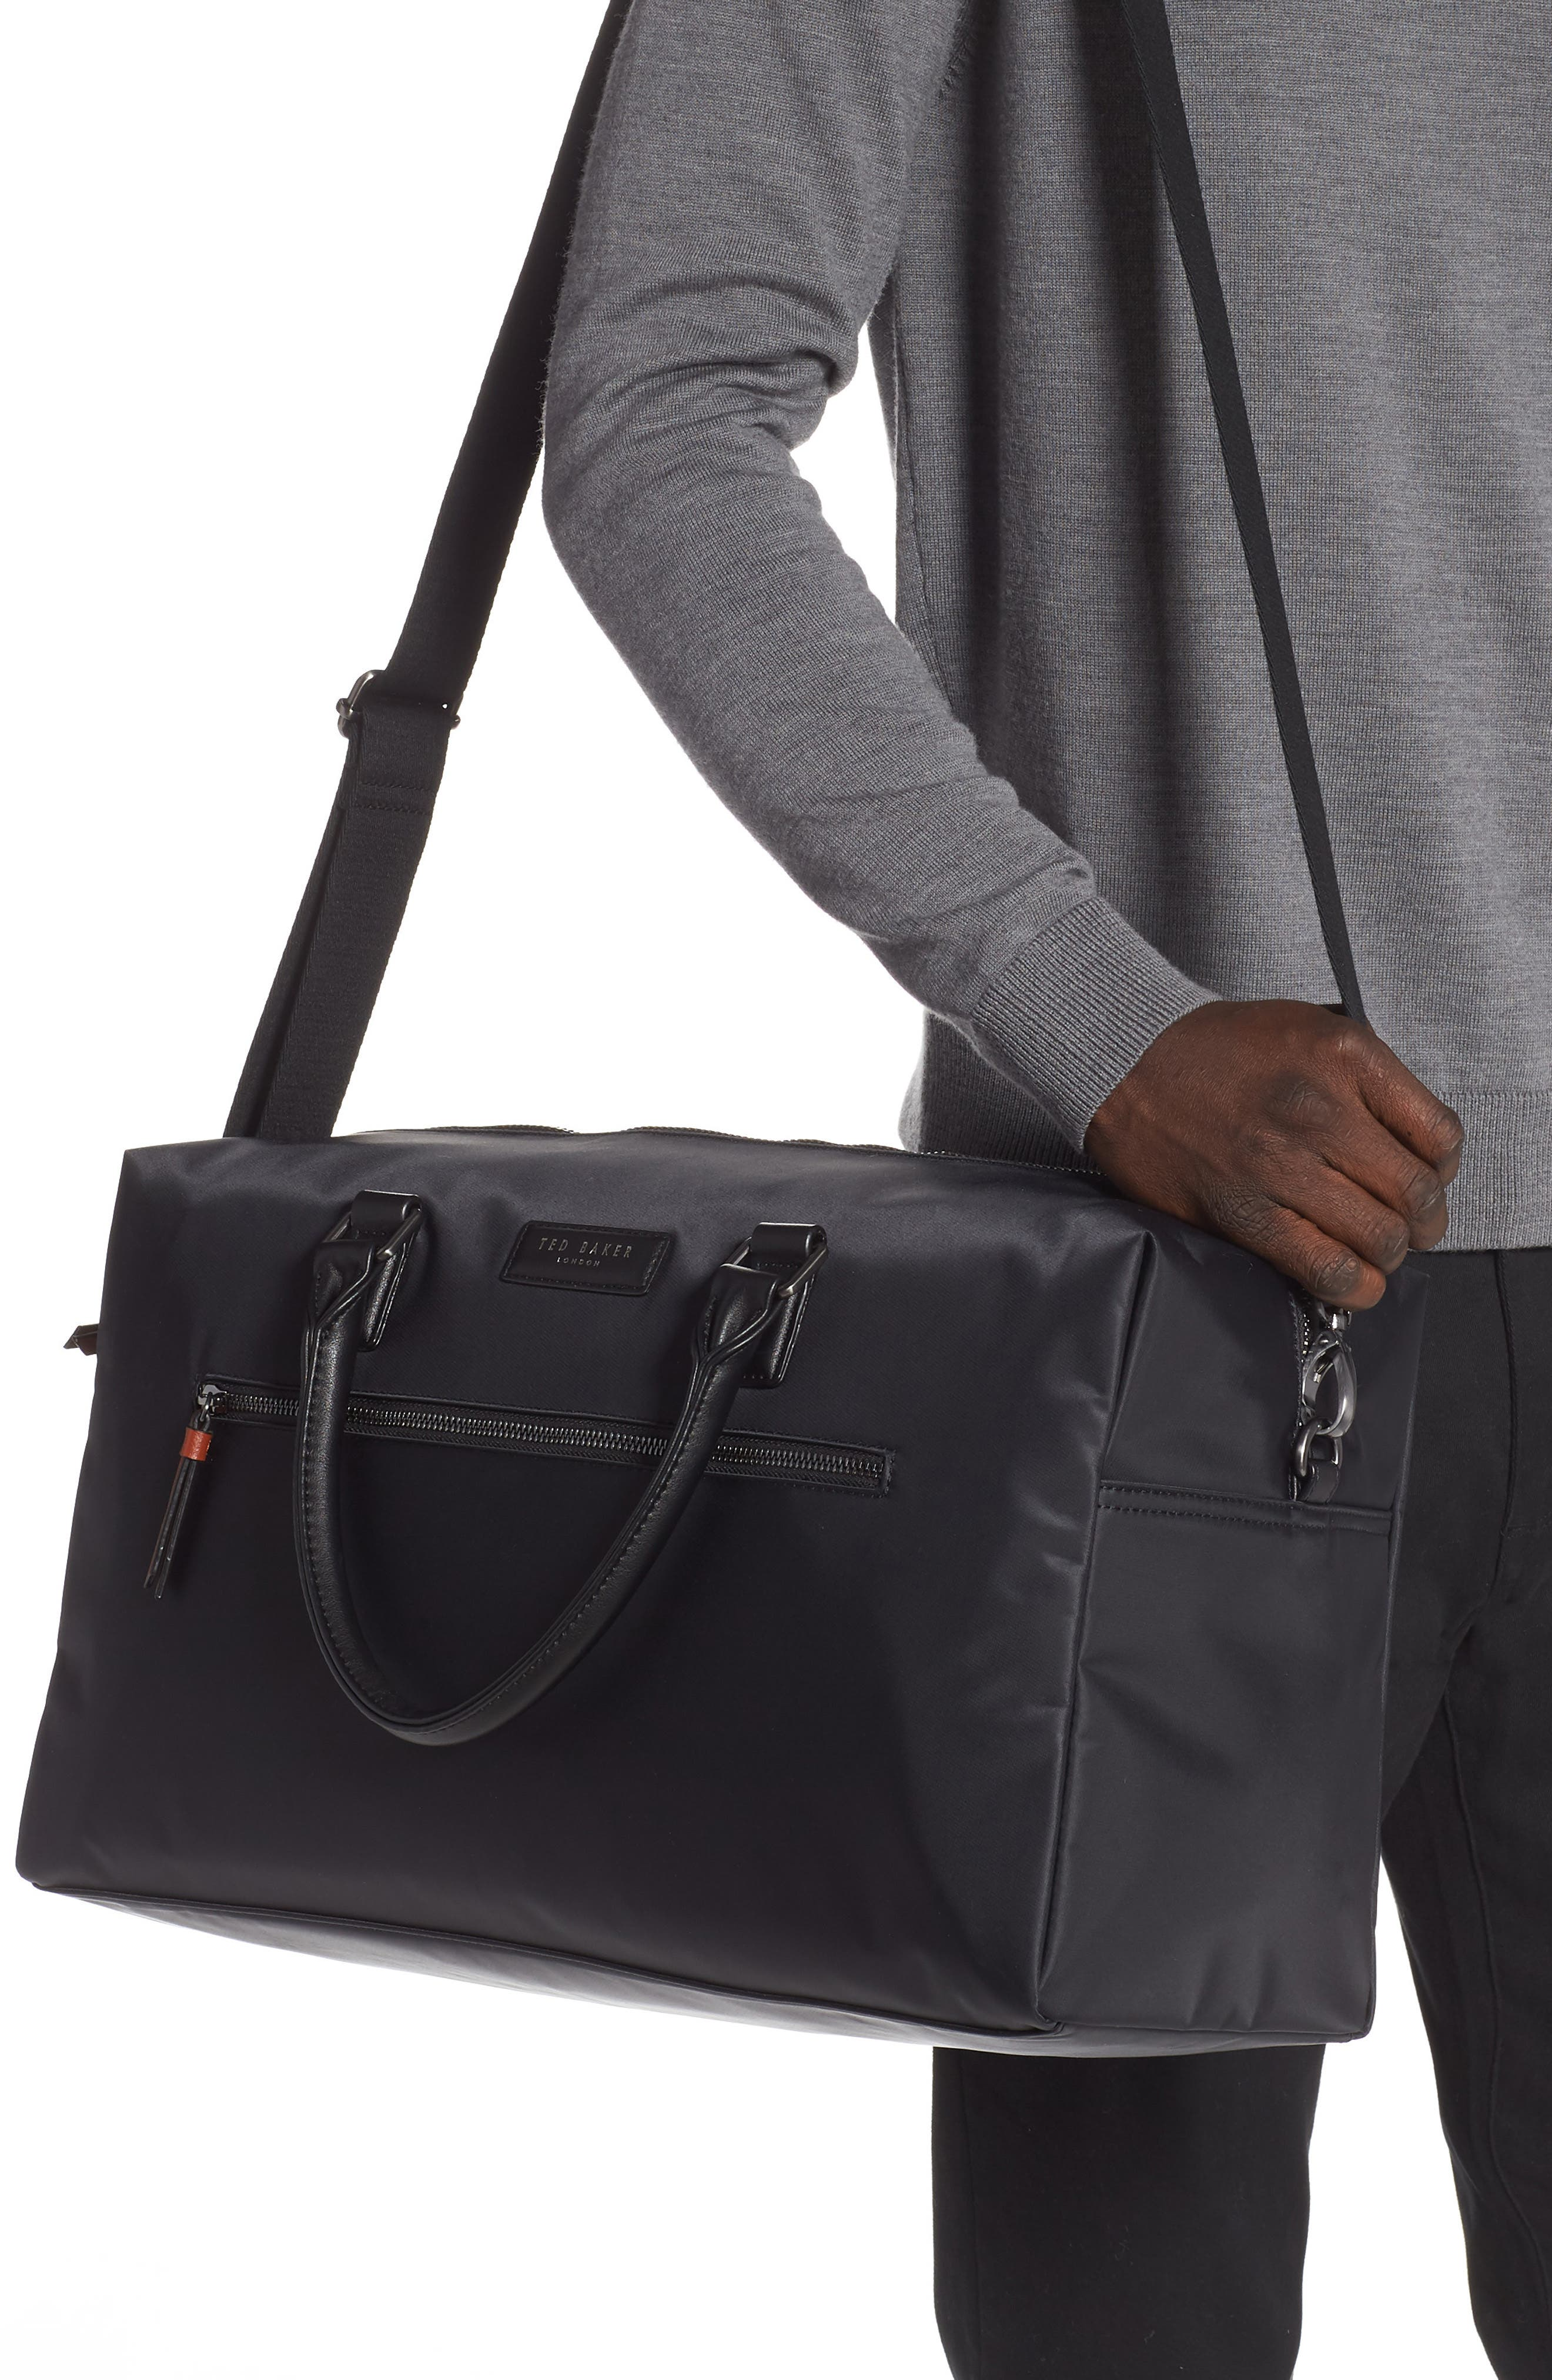 26e55c747 Ted Baker London Duffle Bags   Weekend Bags